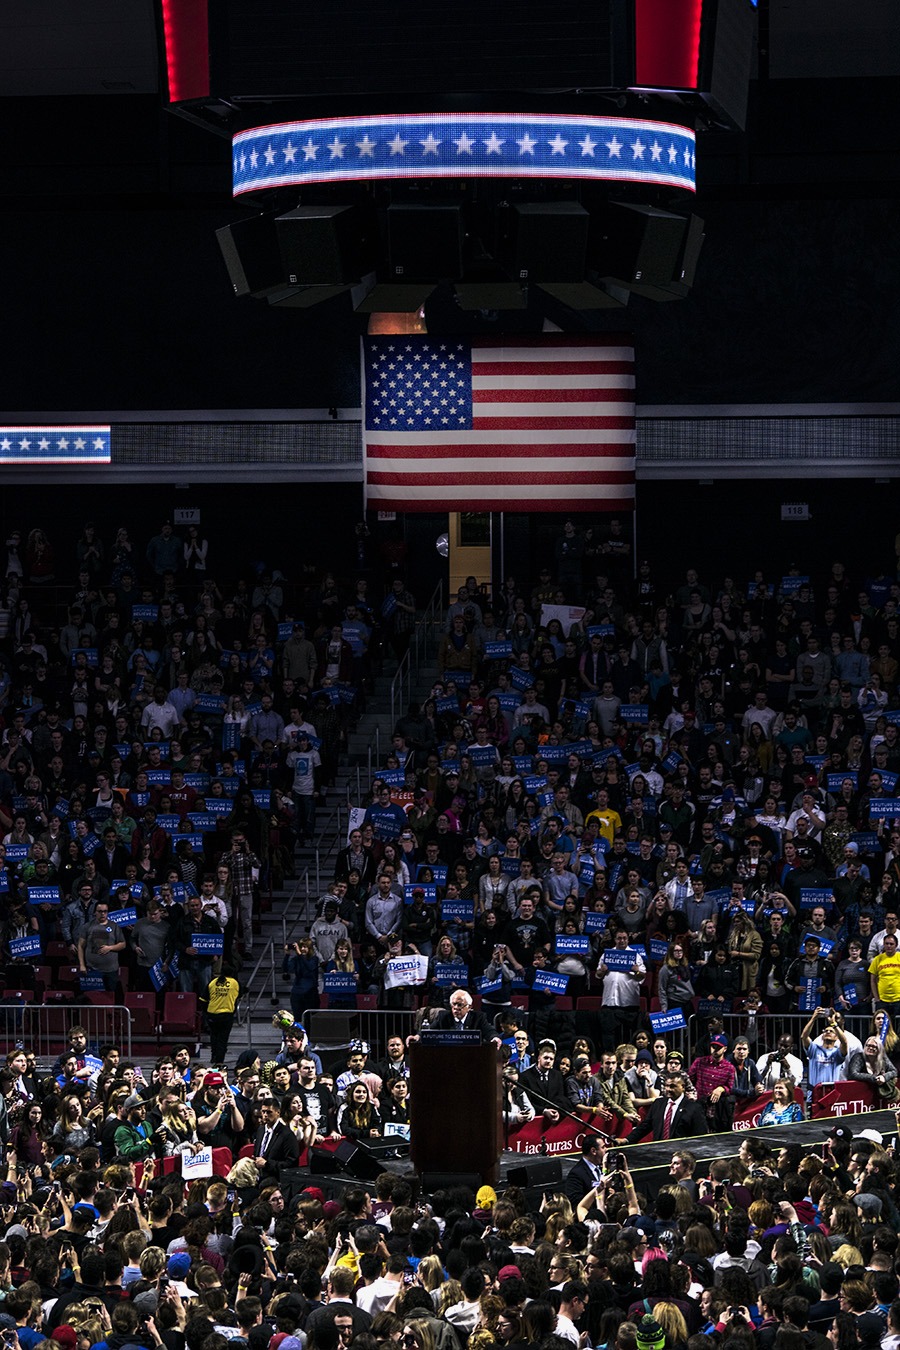 Leniqueca_Welcome_Bernie_Sanders_Rally_Speech_ Supporters_Elections2016_Presedential_Temple_Philadelphia_America_Patriotic